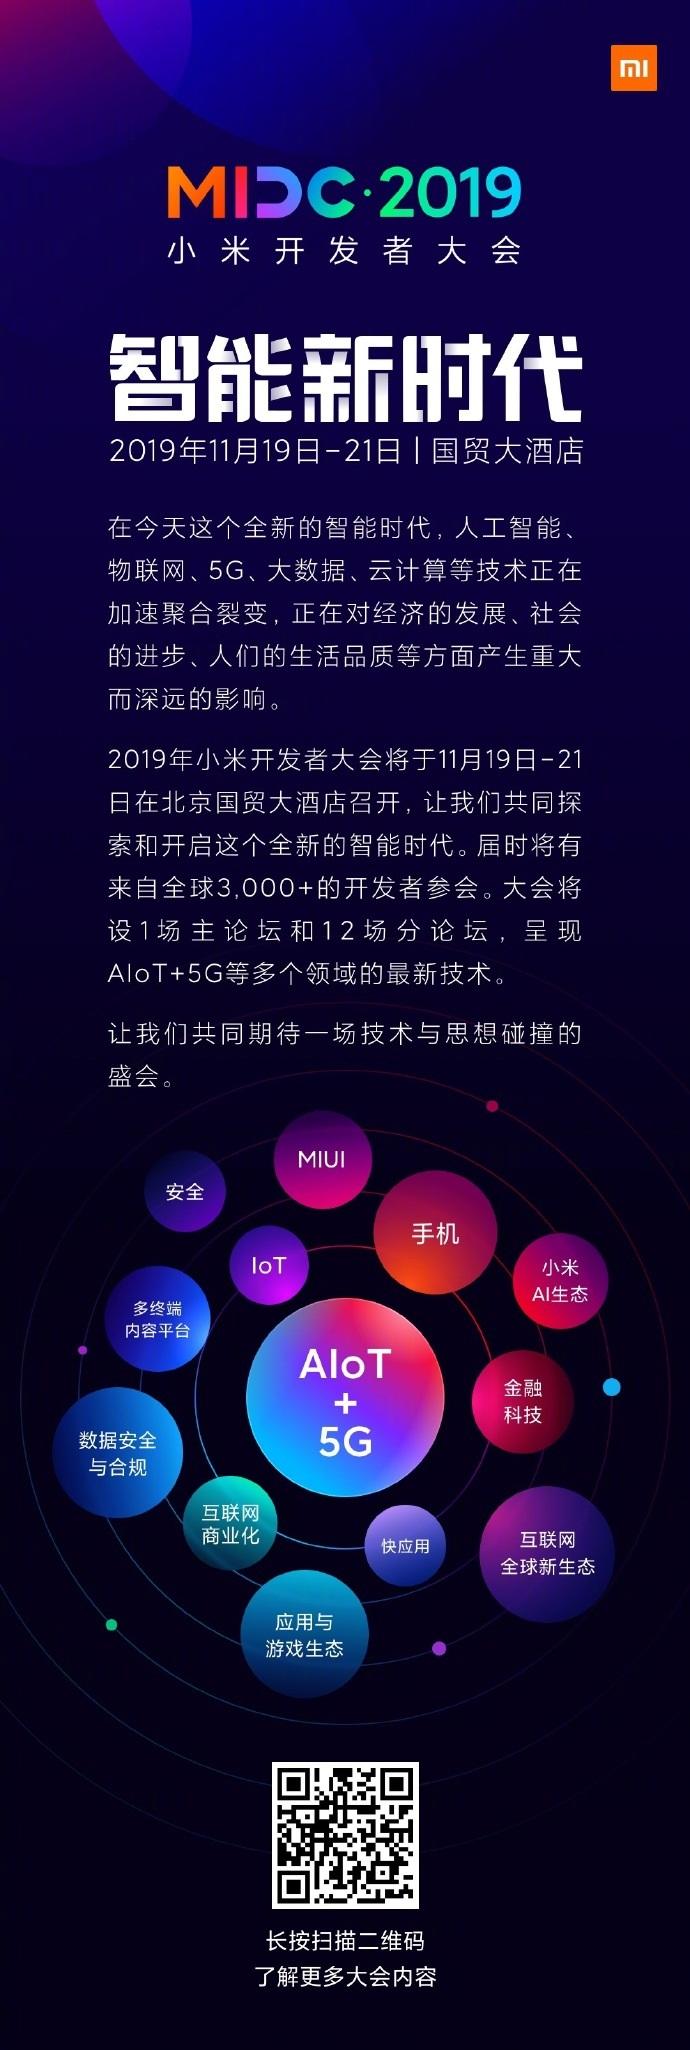 5G+AIoT:2019小米开发者大会将在11月19日-21日北京举行